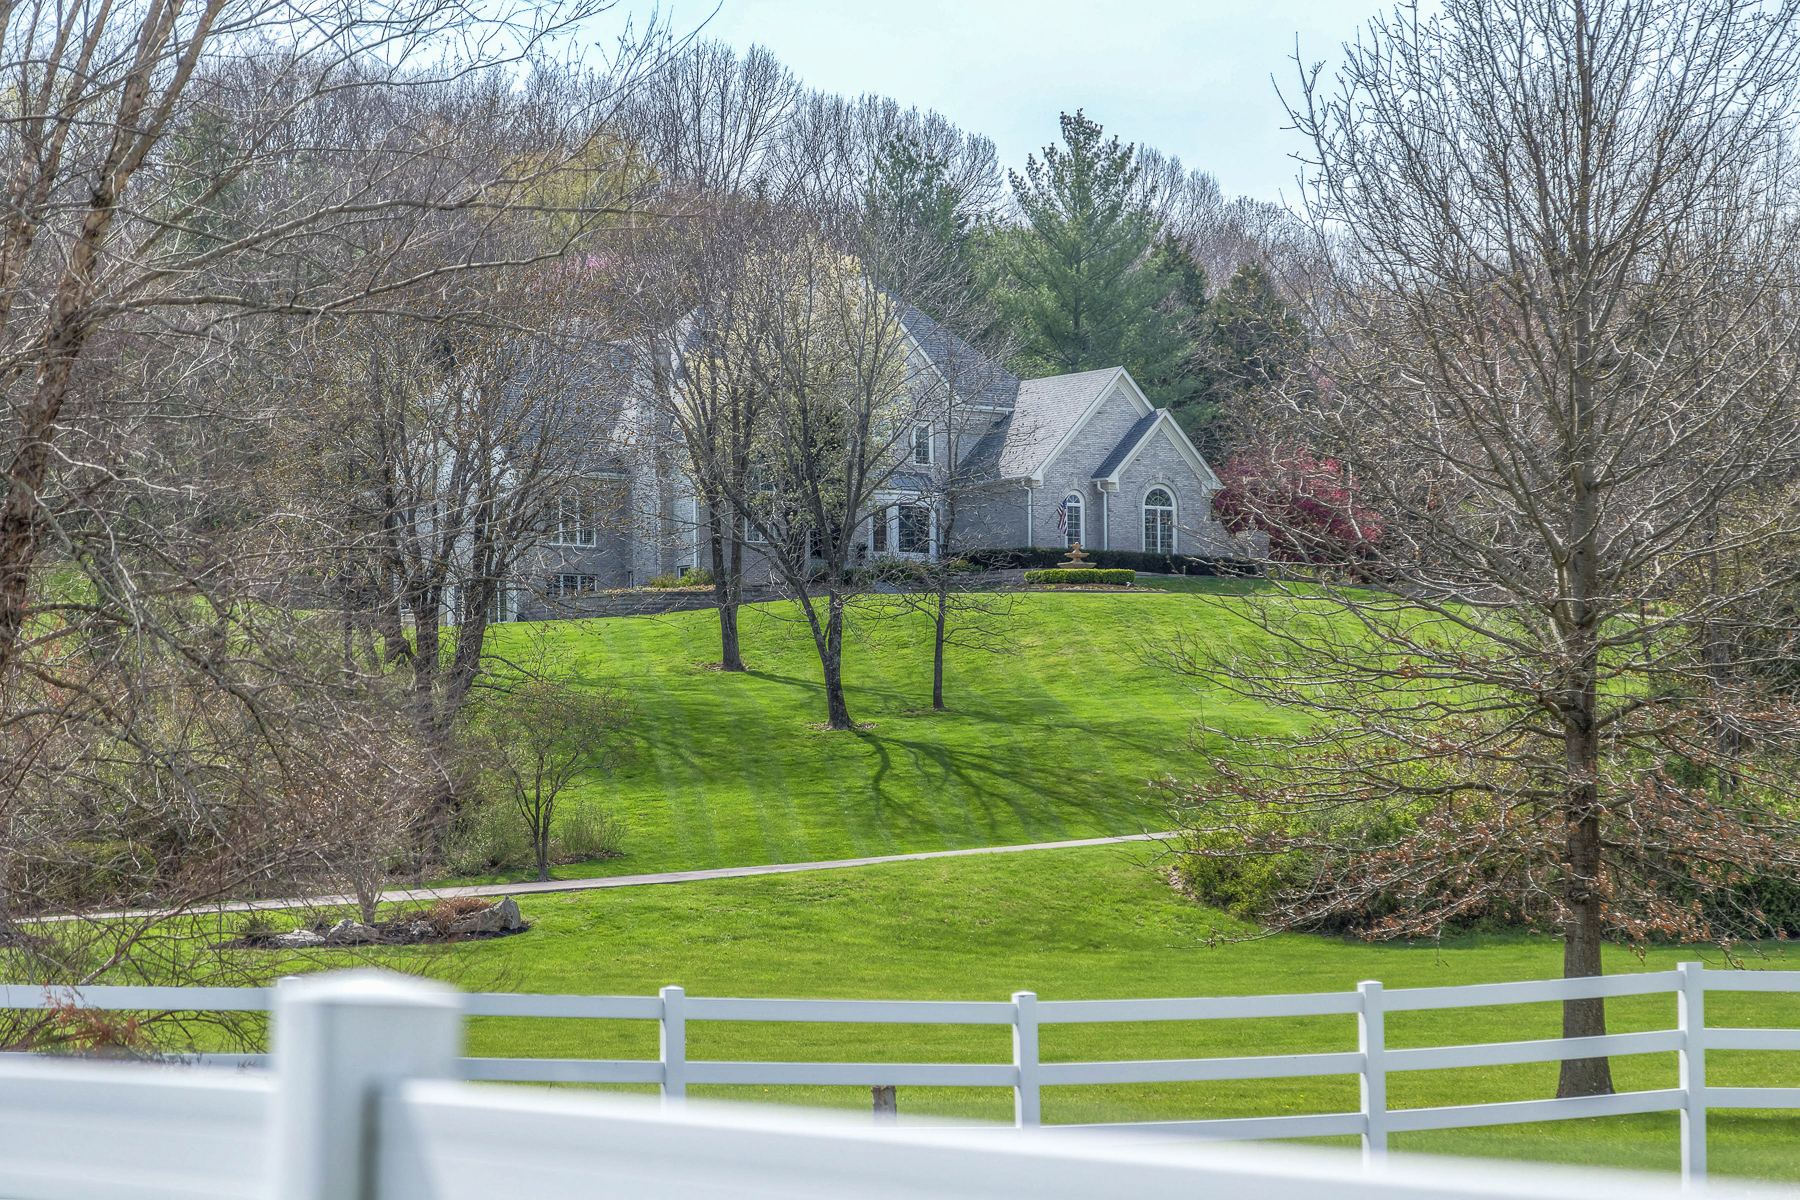 獨棟家庭住宅 為 出售 在 Deer Pointe Estates 19300 Deer Pointe Estates Drive Wildwood, 密蘇里州, 63038 美國